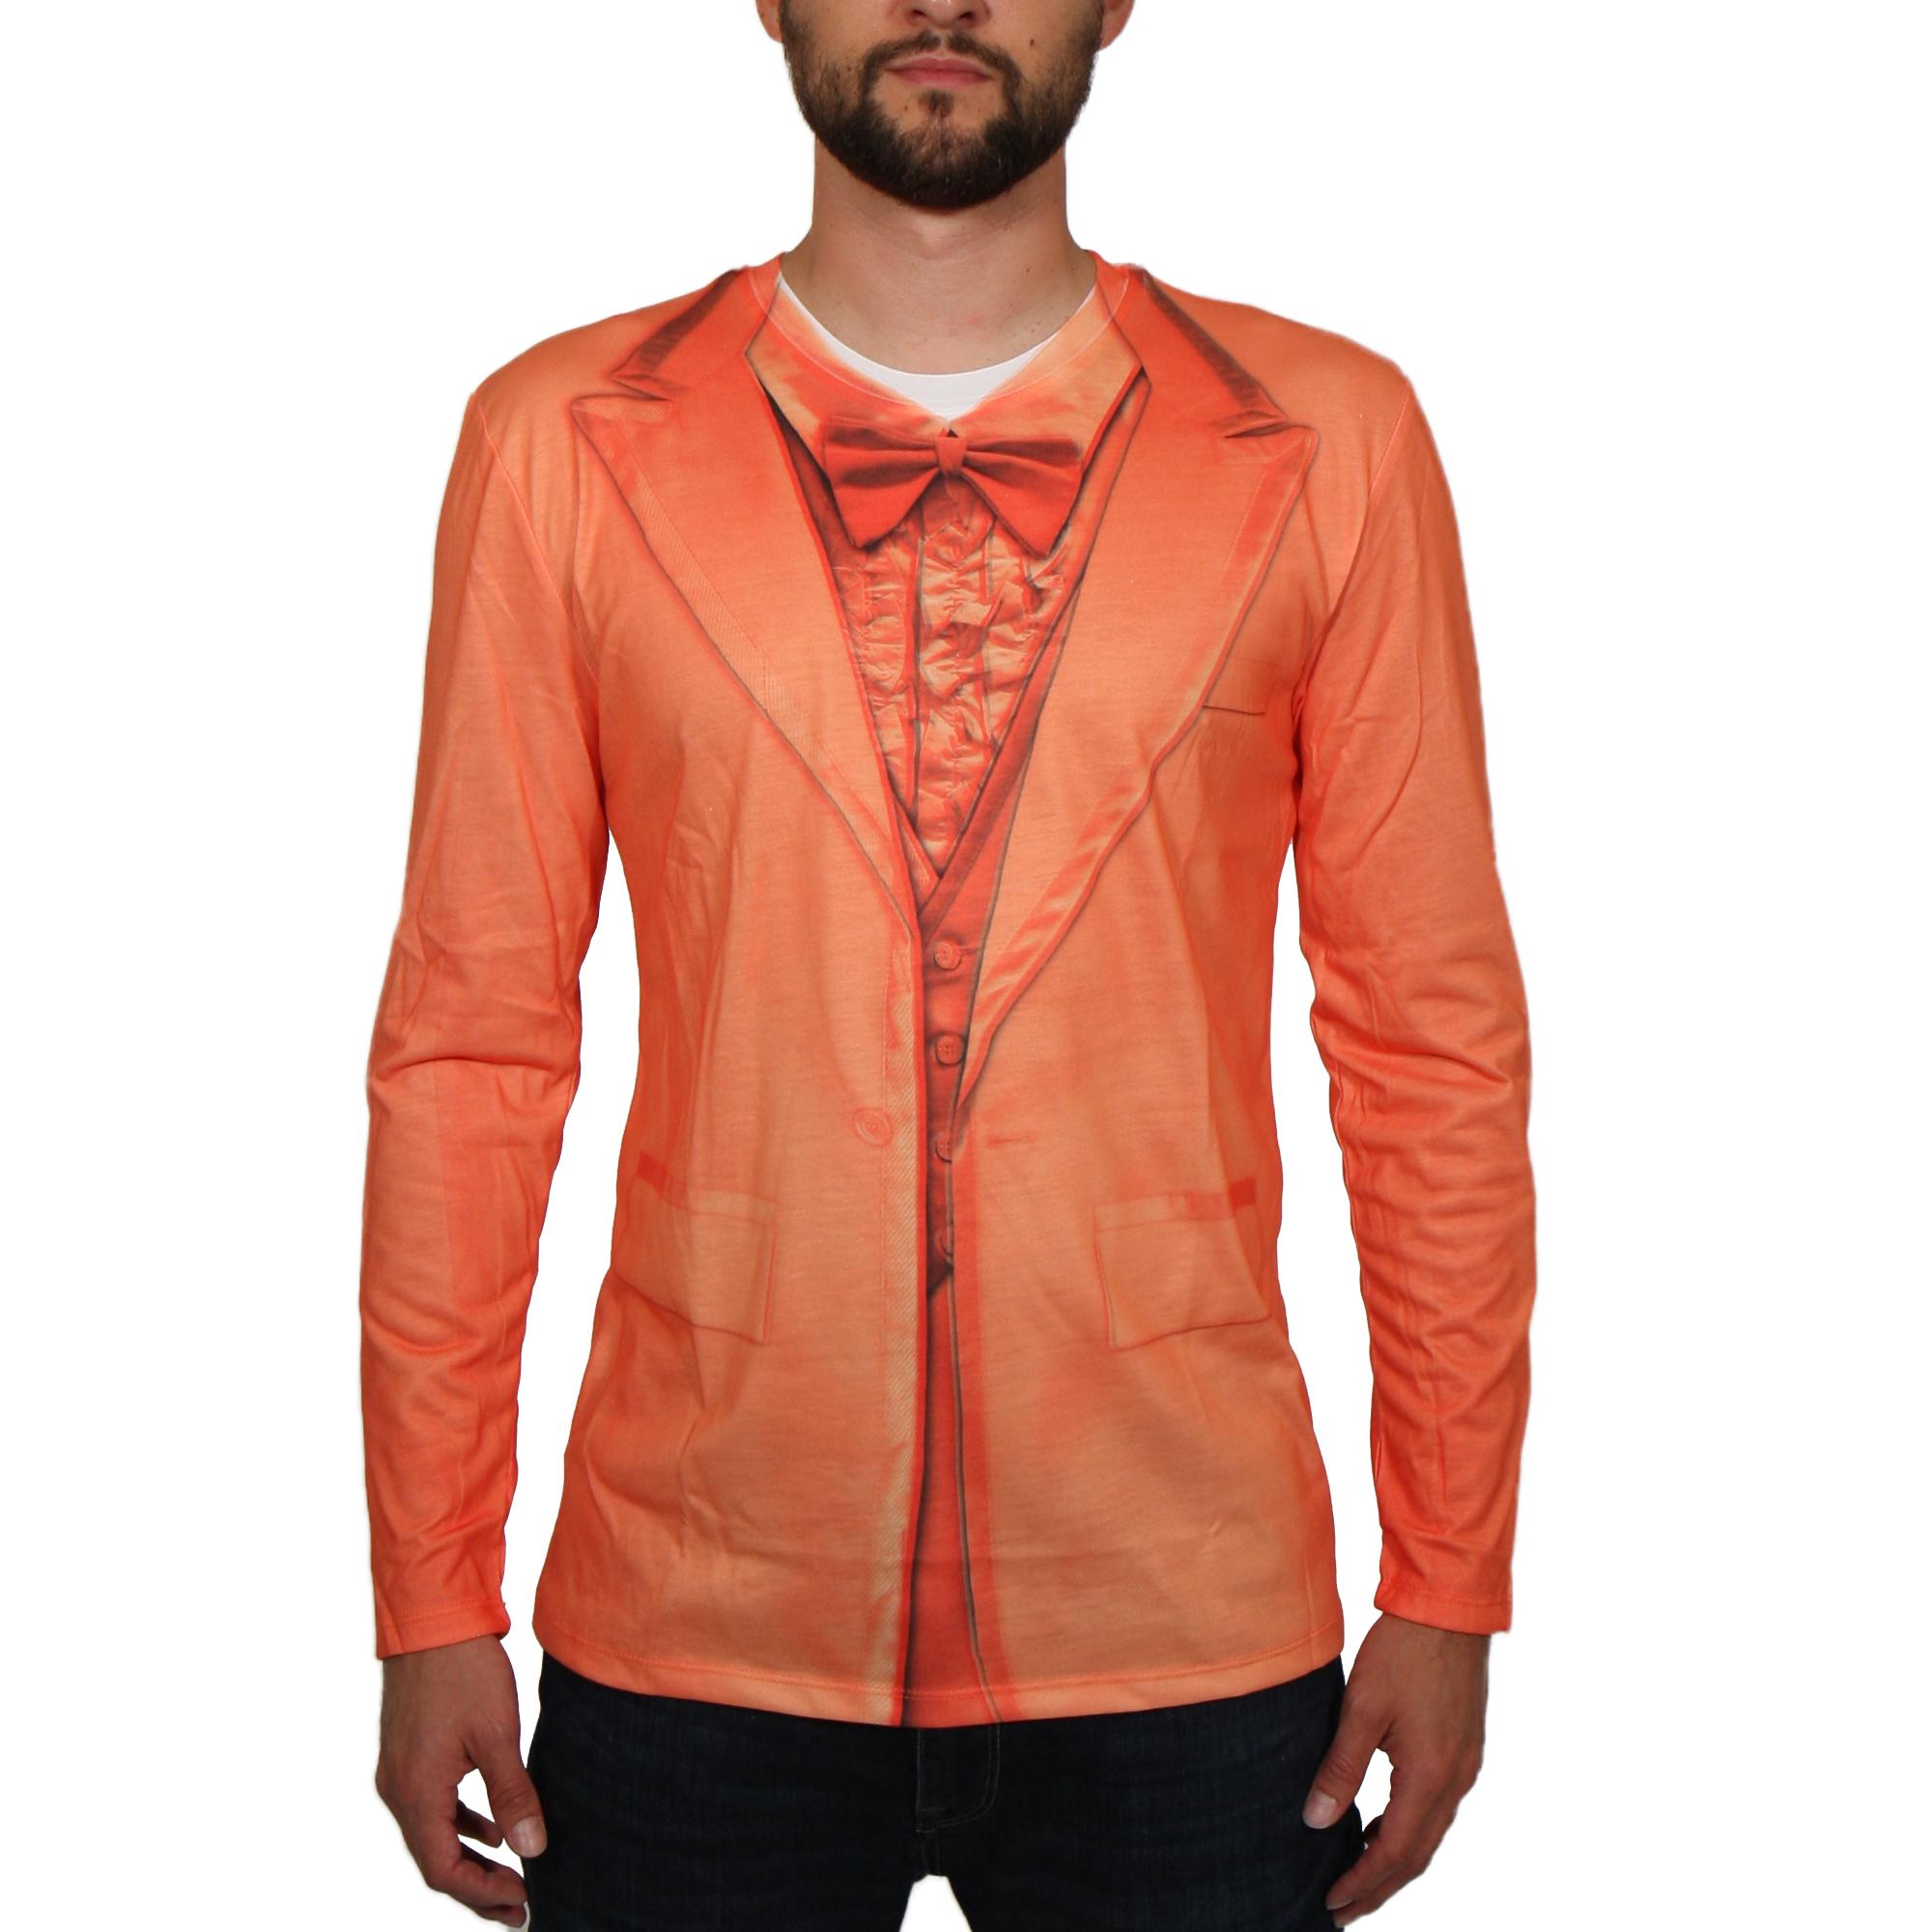 Orange Tuxedo Men's Long Sleeve Tee Shirt